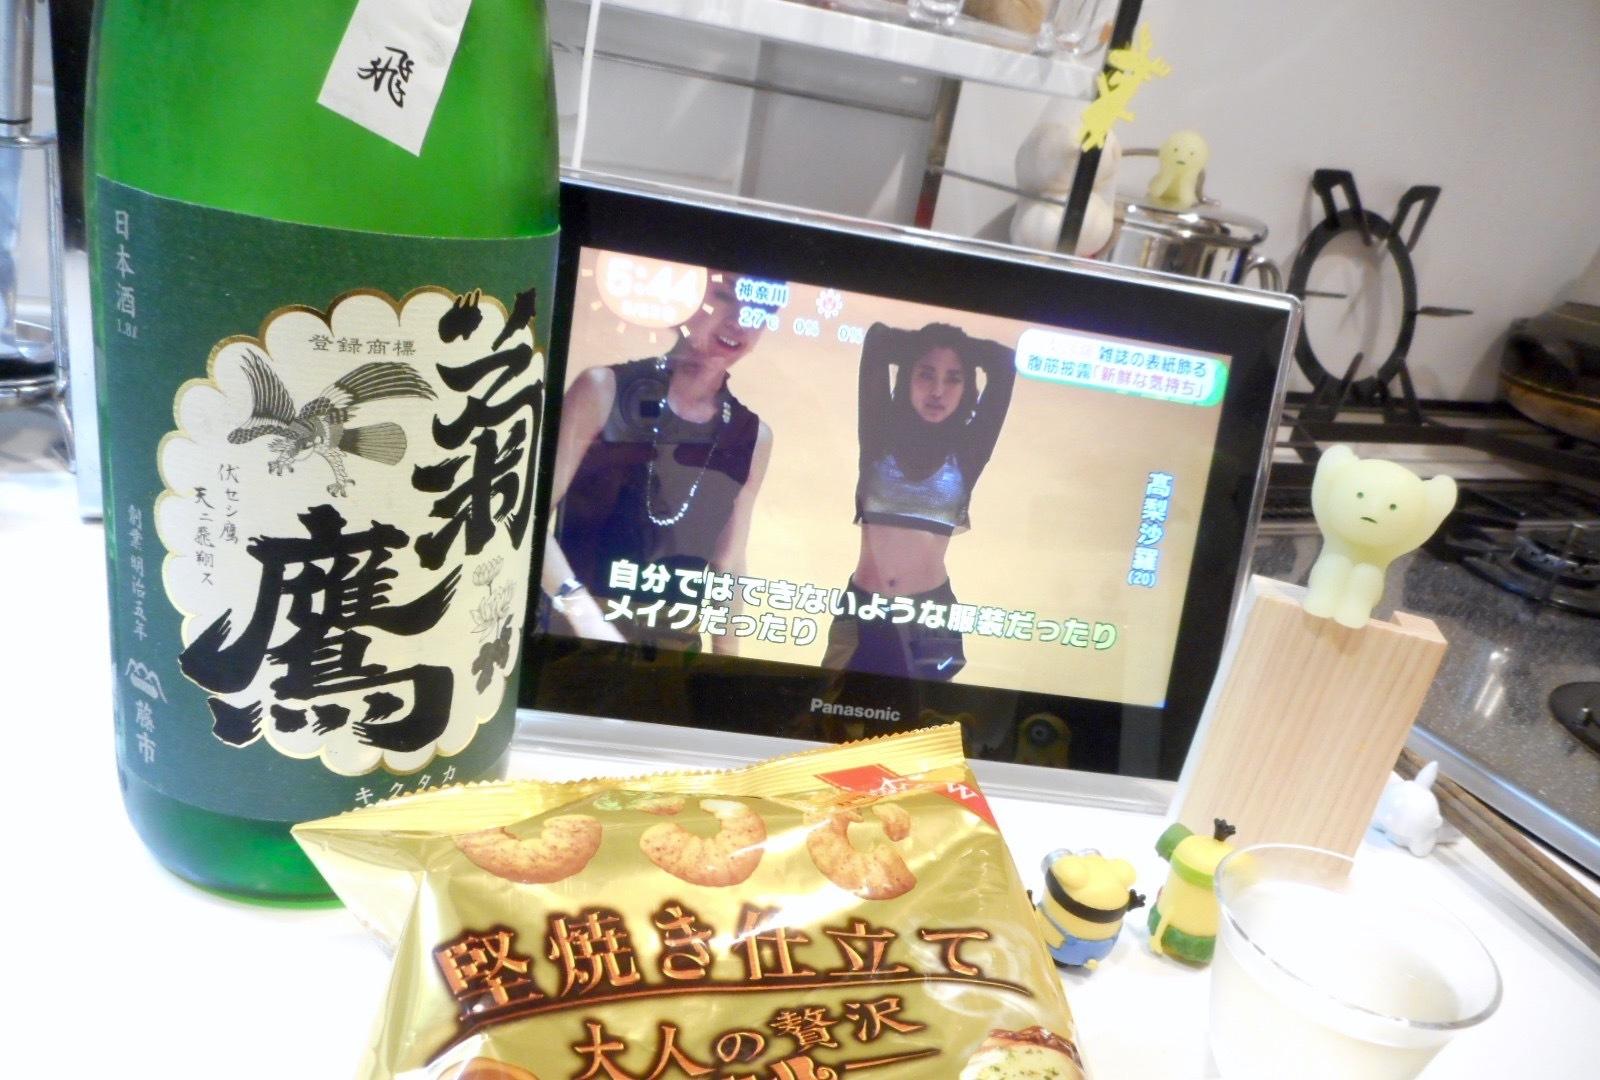 kikutaka_yuuhi_2nen_jukusei13.jpg